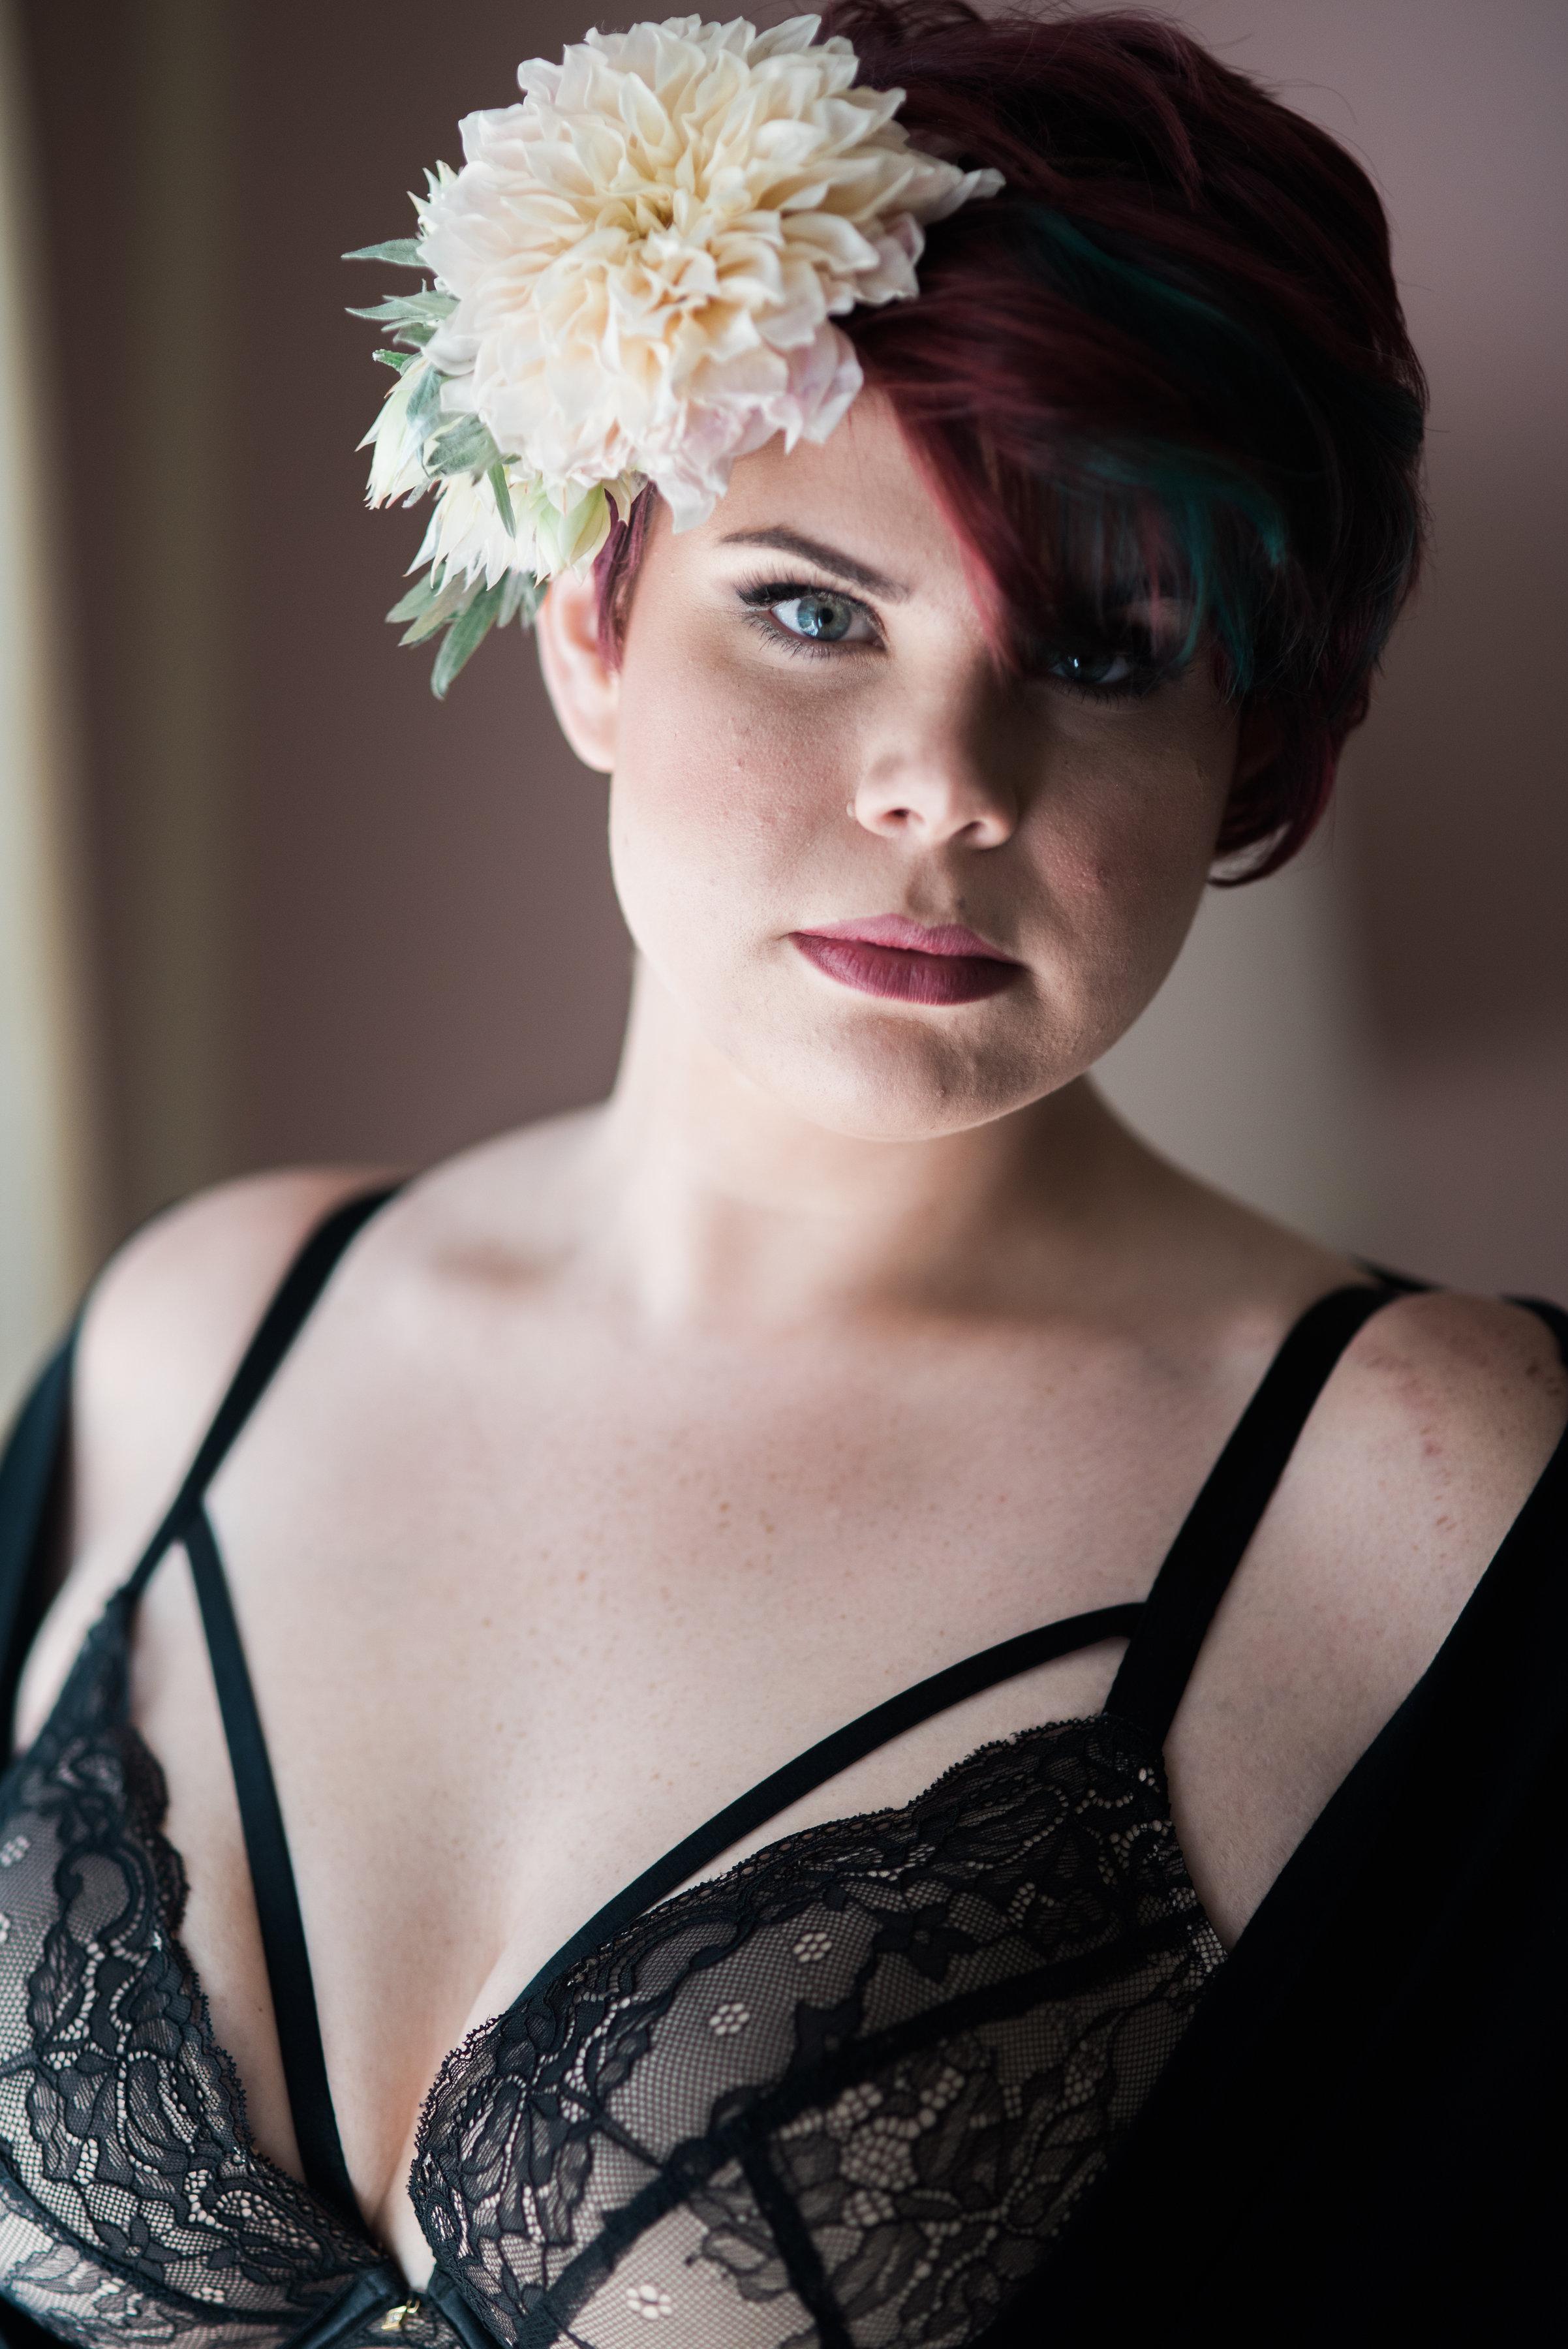 toms-river-boudoir-photography